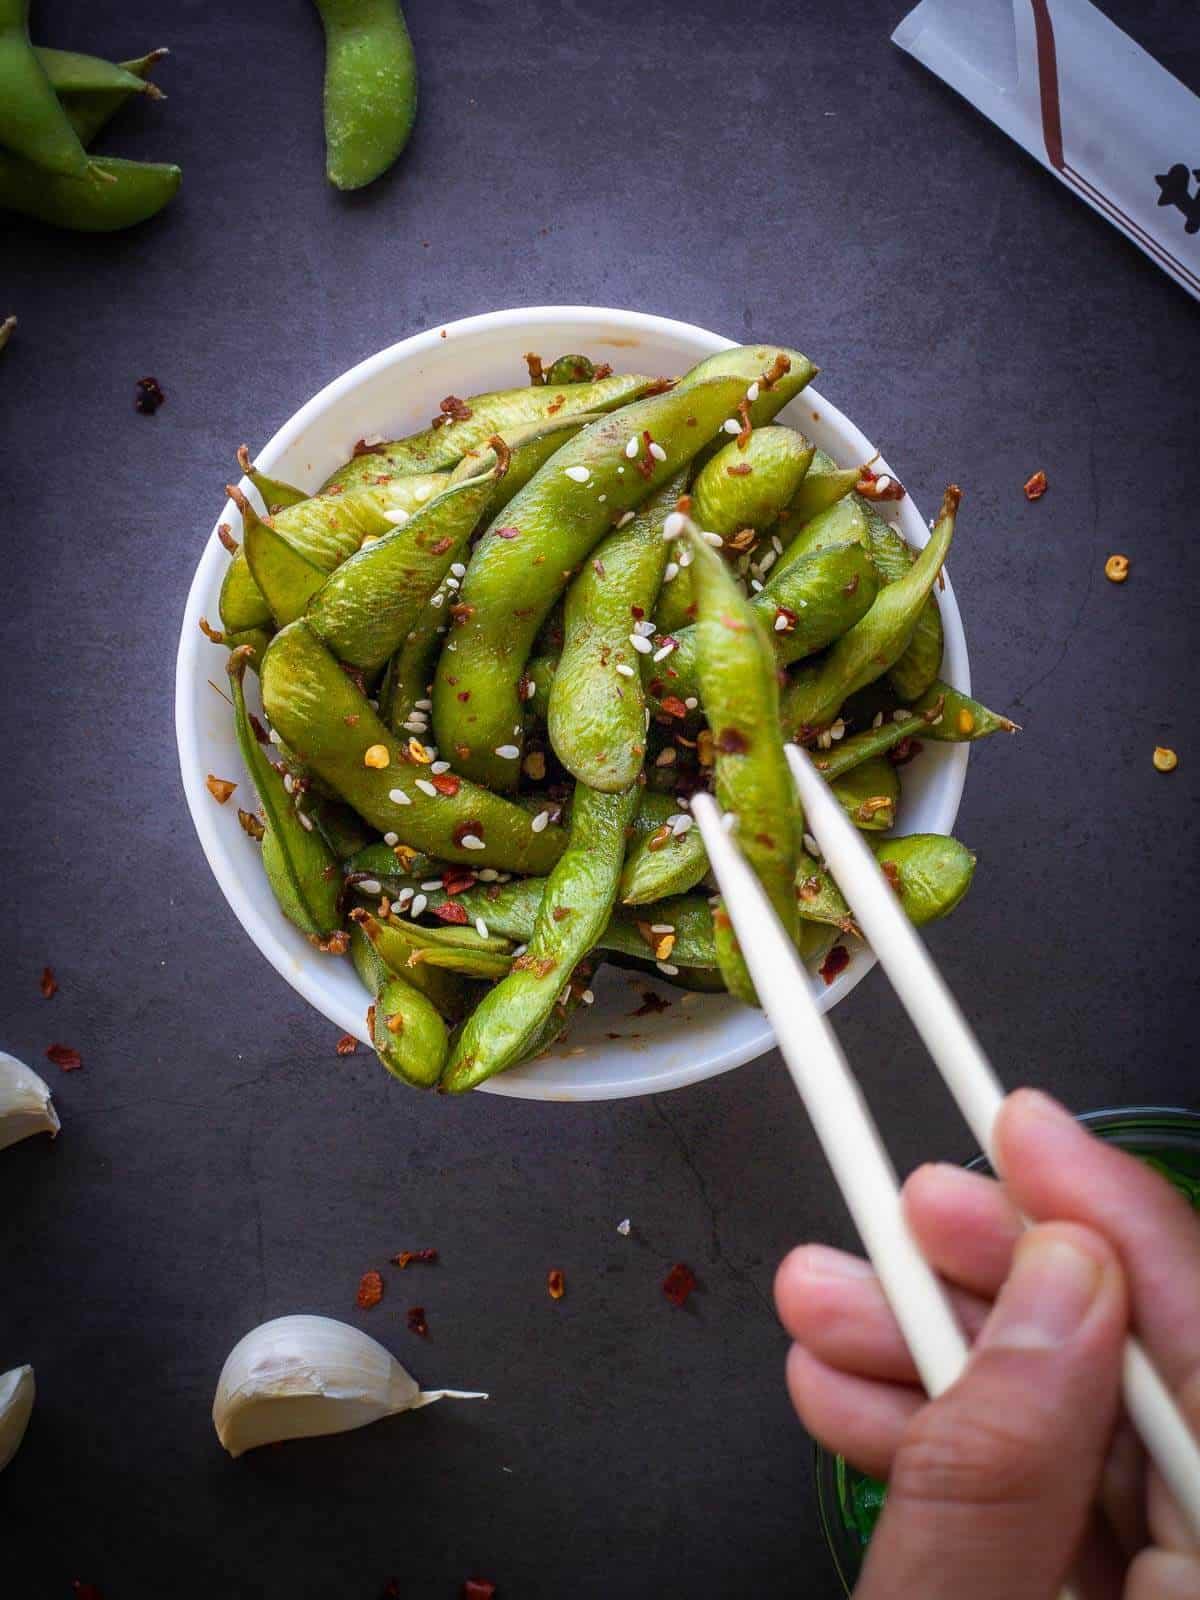 garlic edamame served with chopsticks